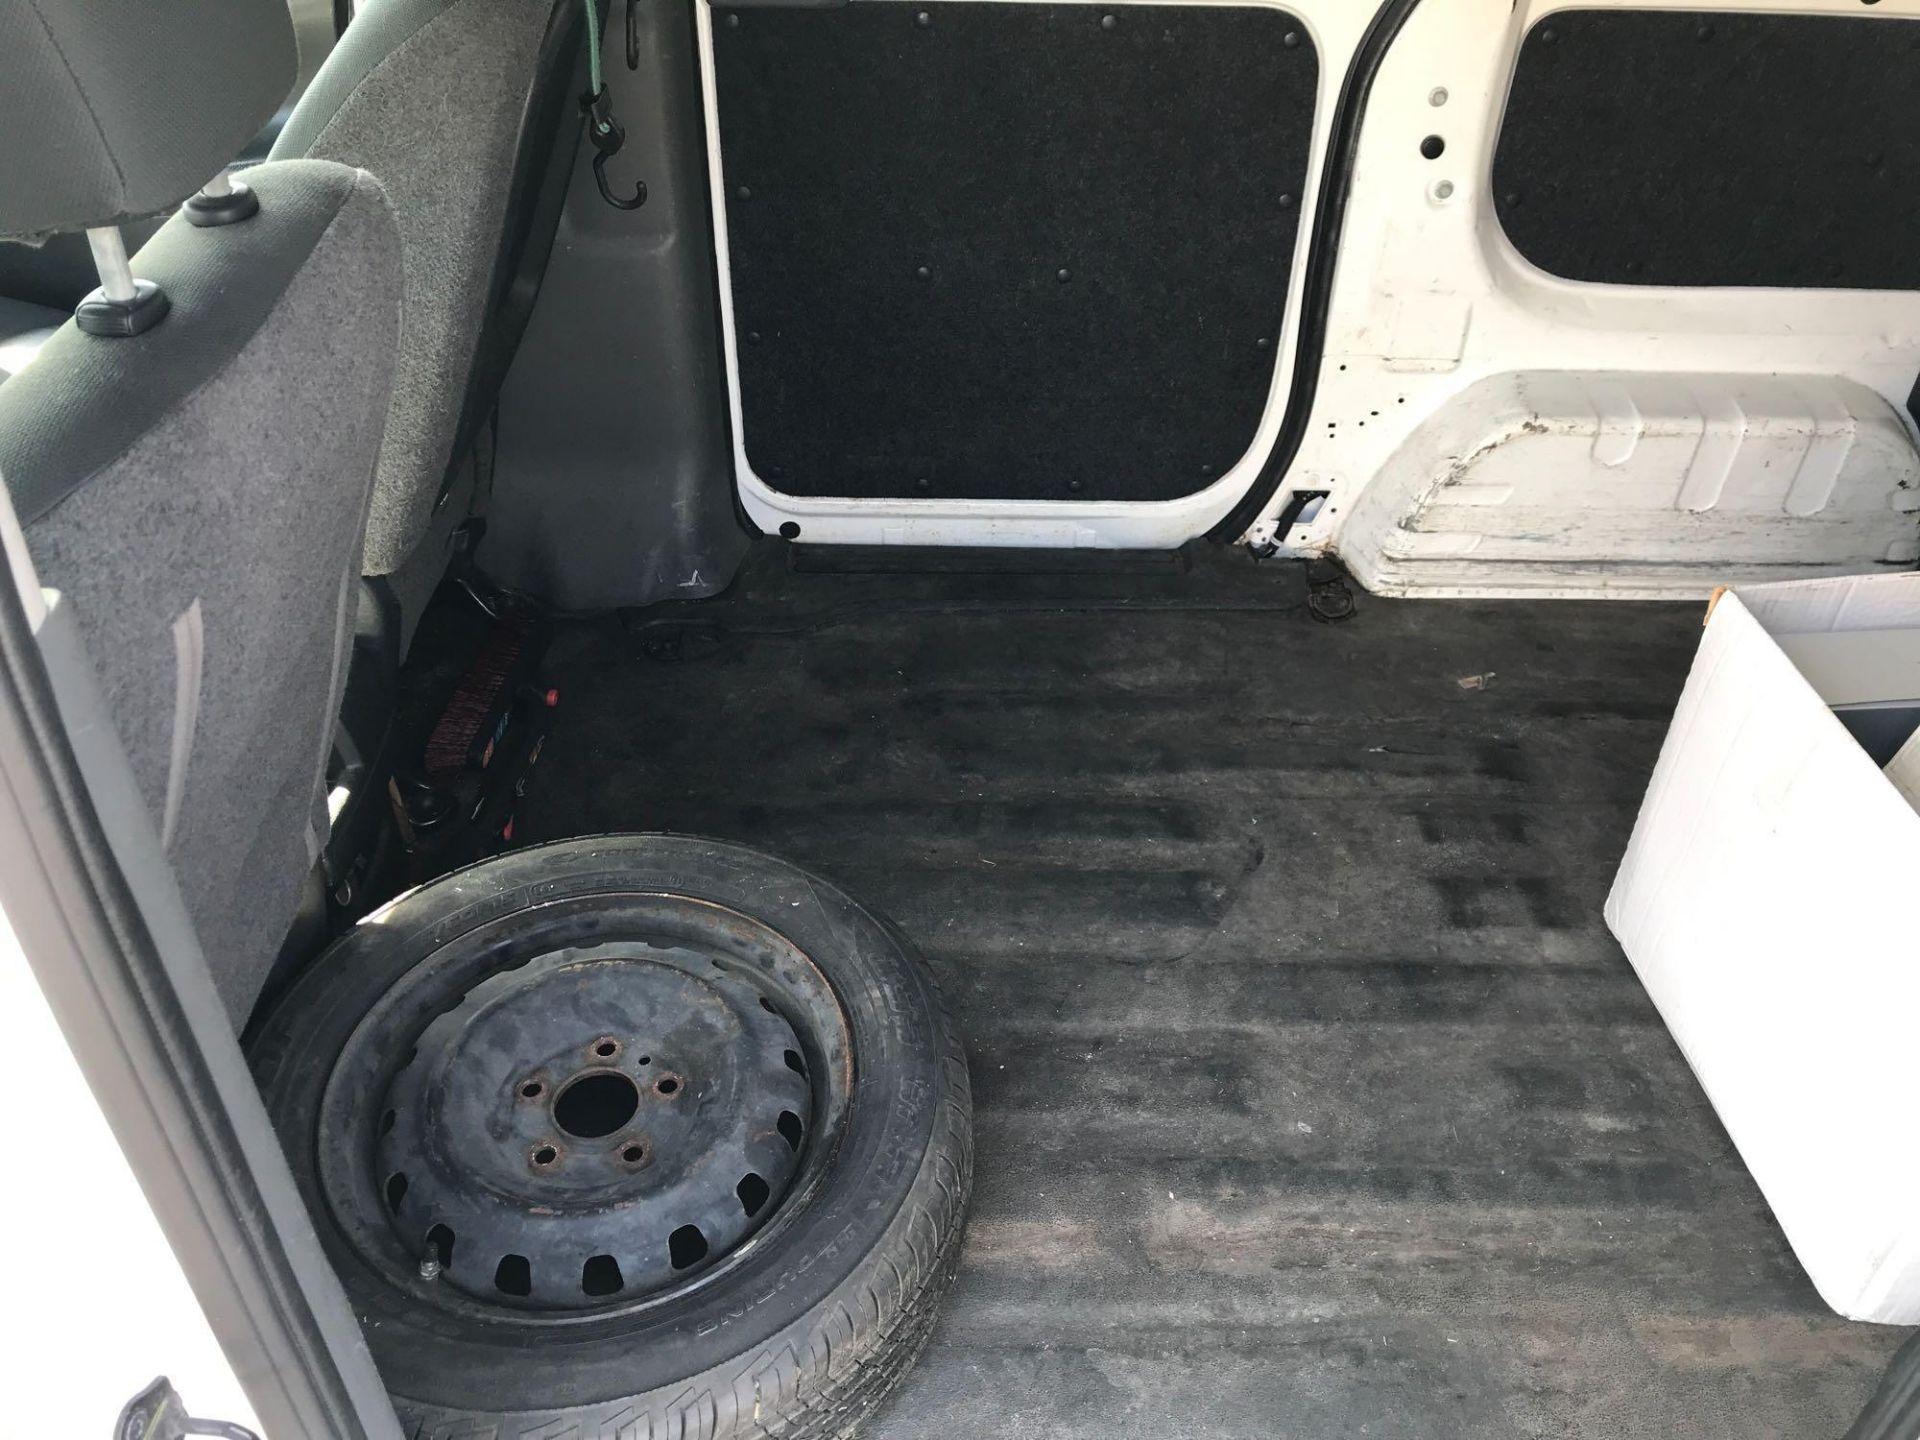 2013 Nissan NV200 Delivery Van - Image 32 of 54